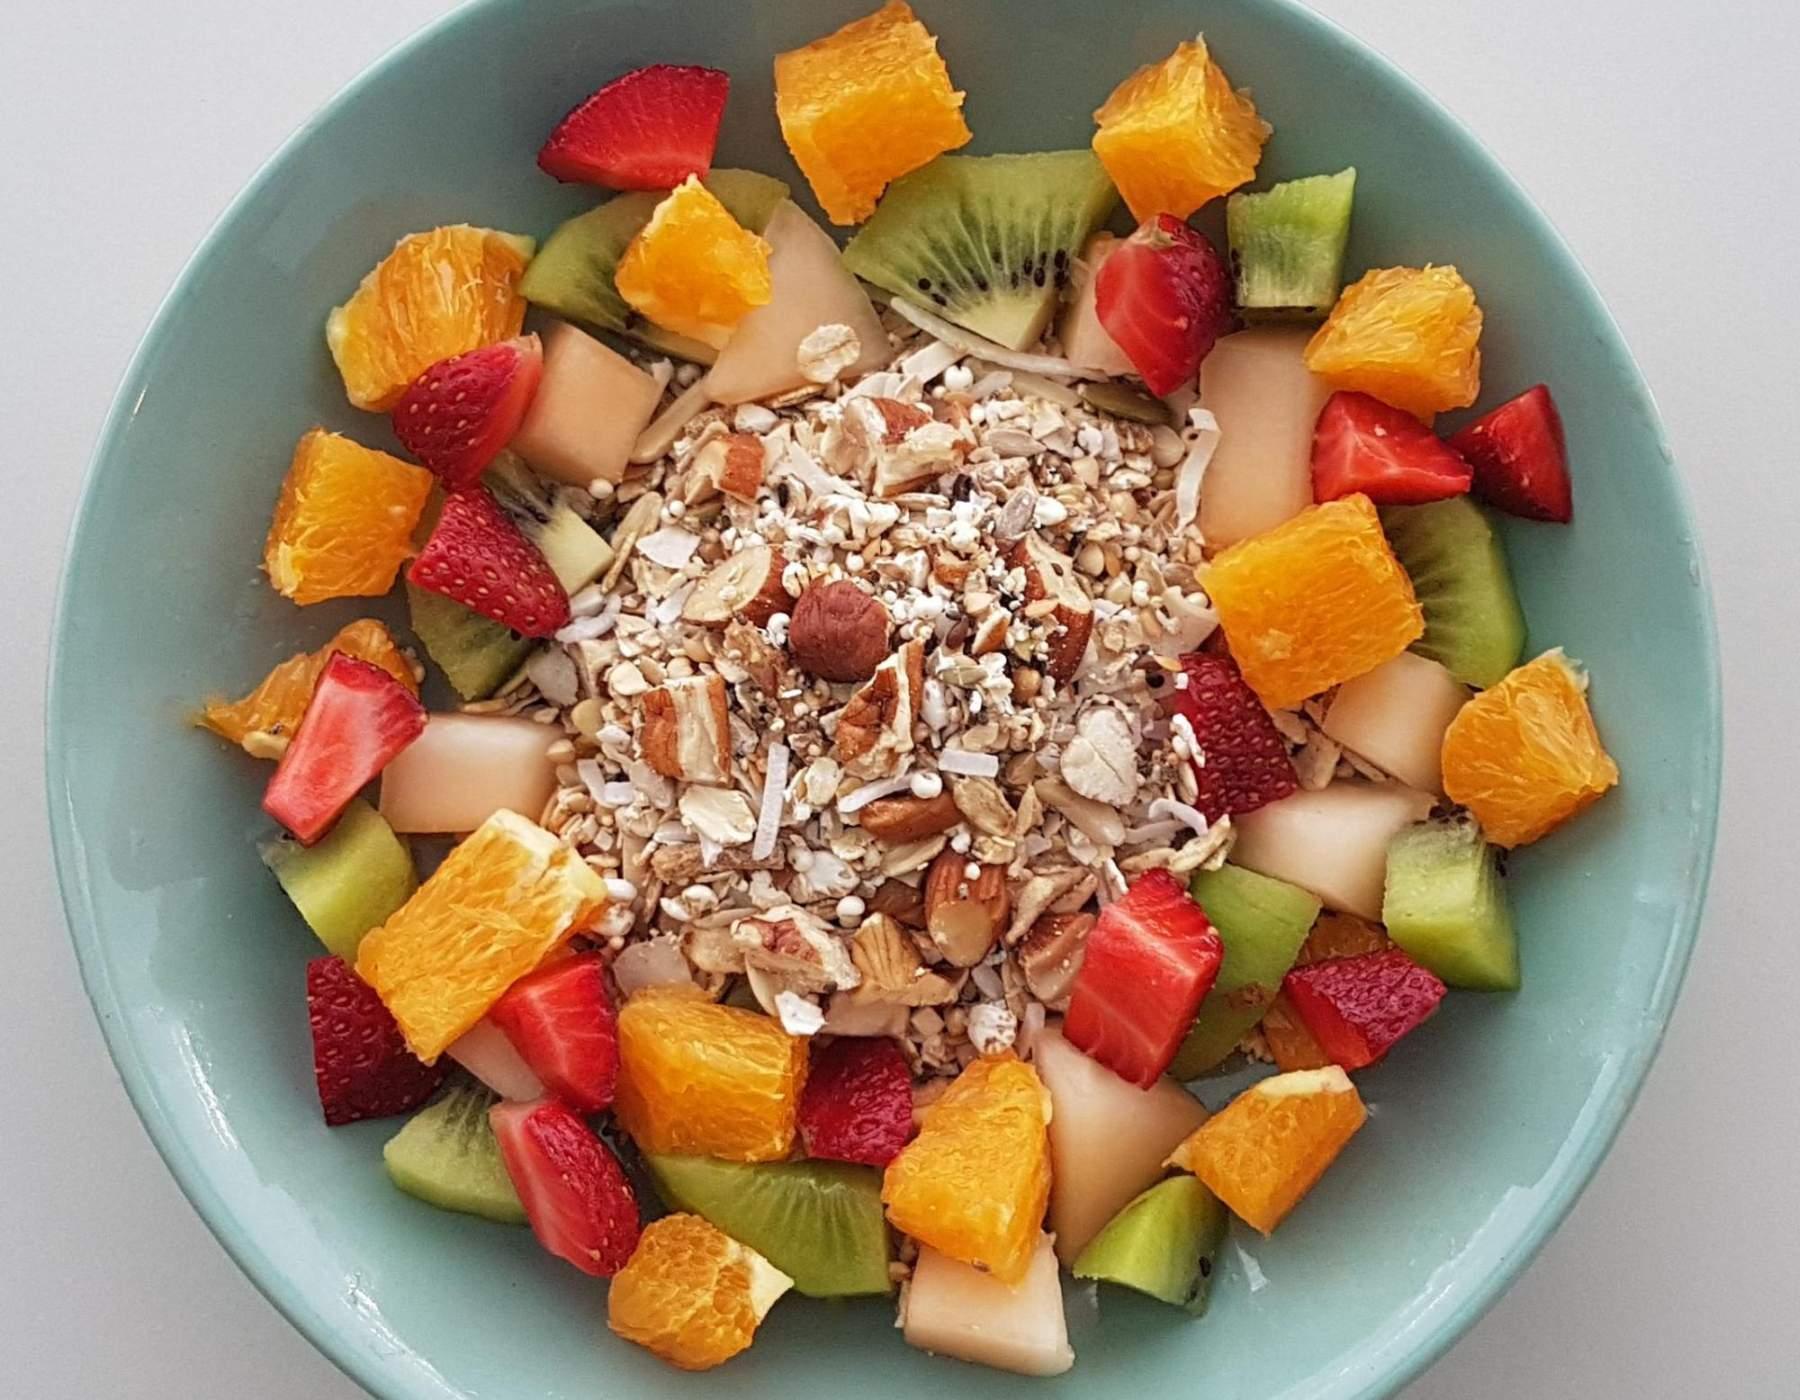 Home-made muesli with fresh fruit